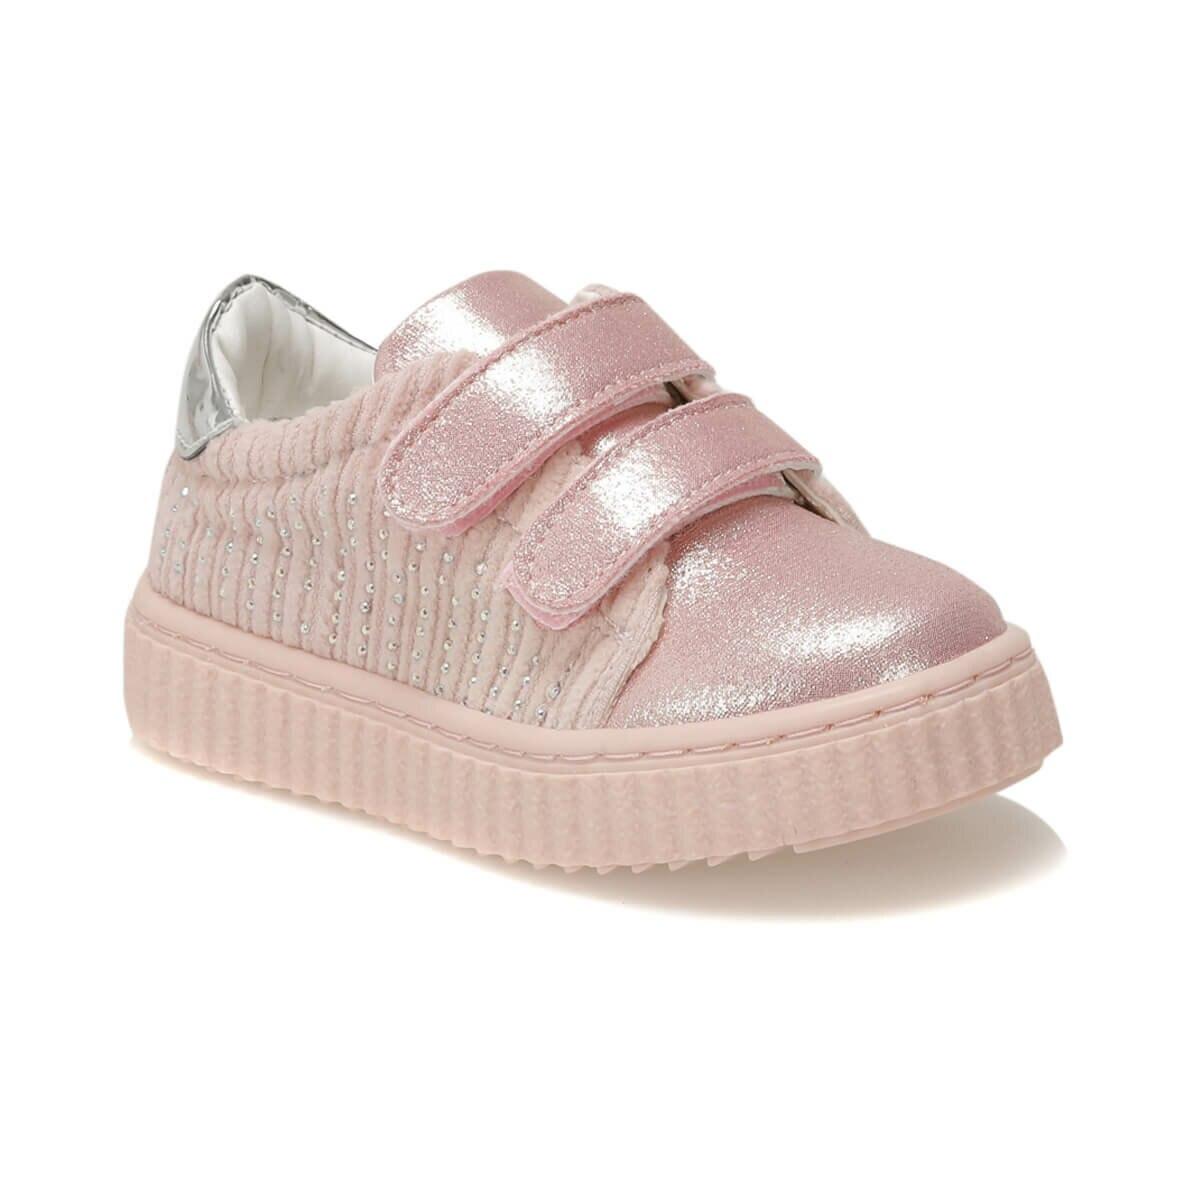 FLO 91. OBBI. B Powder Female Child Shoes PINKSTEP